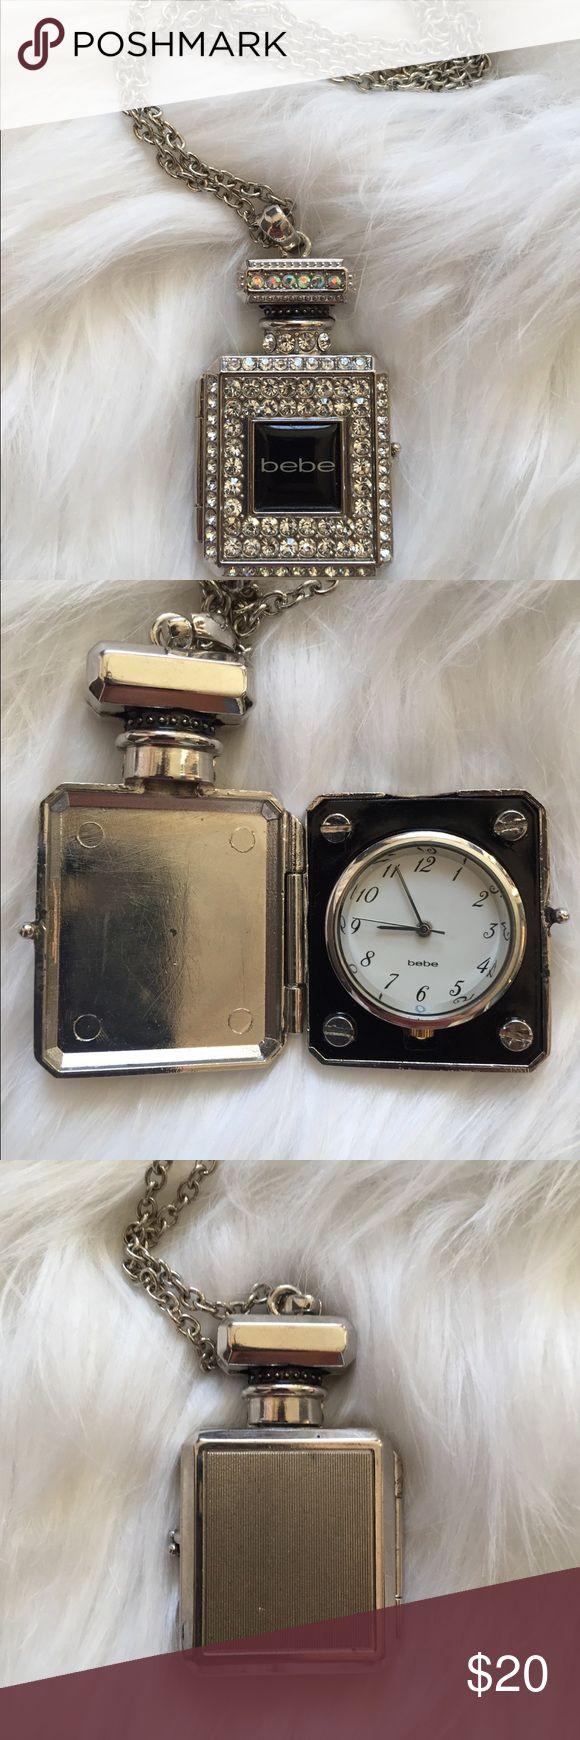 Bebe perfume bottle clock locket Bebe locket long necklace. No missing stones clock just needs a new battery. bebe Jewelry Necklaces